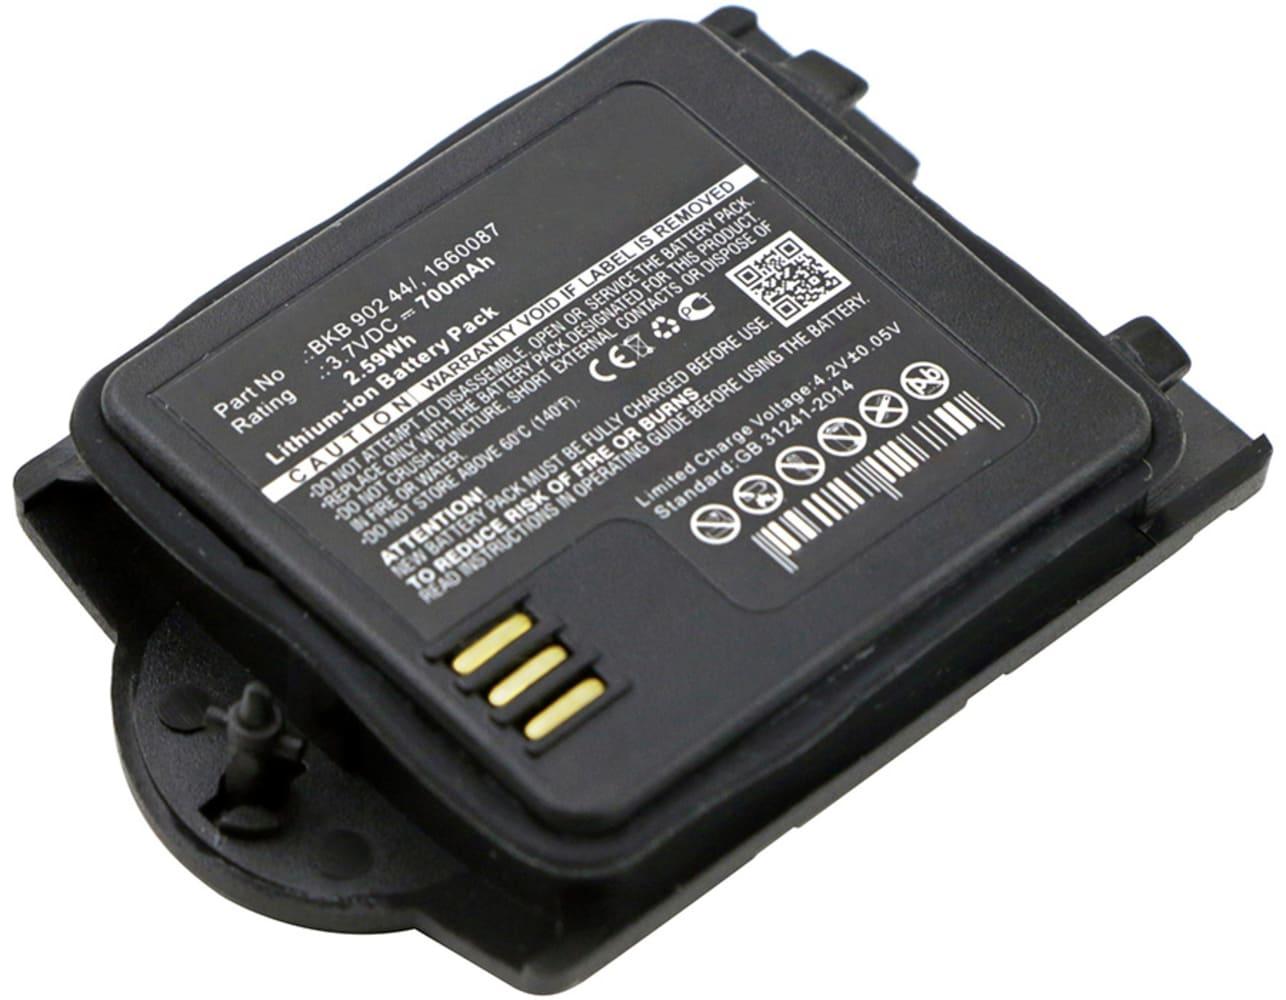 Batterie pour téléphone fixe Ascom Grade 3, Ascom Messenger, Ascom Talker, Ascom Raid2 9D24 MKII, Ericsson DT412 V2, DT422 V2 - 660087,660088,BKB 902 44/1,BKBNB 902 44/1 700mAh